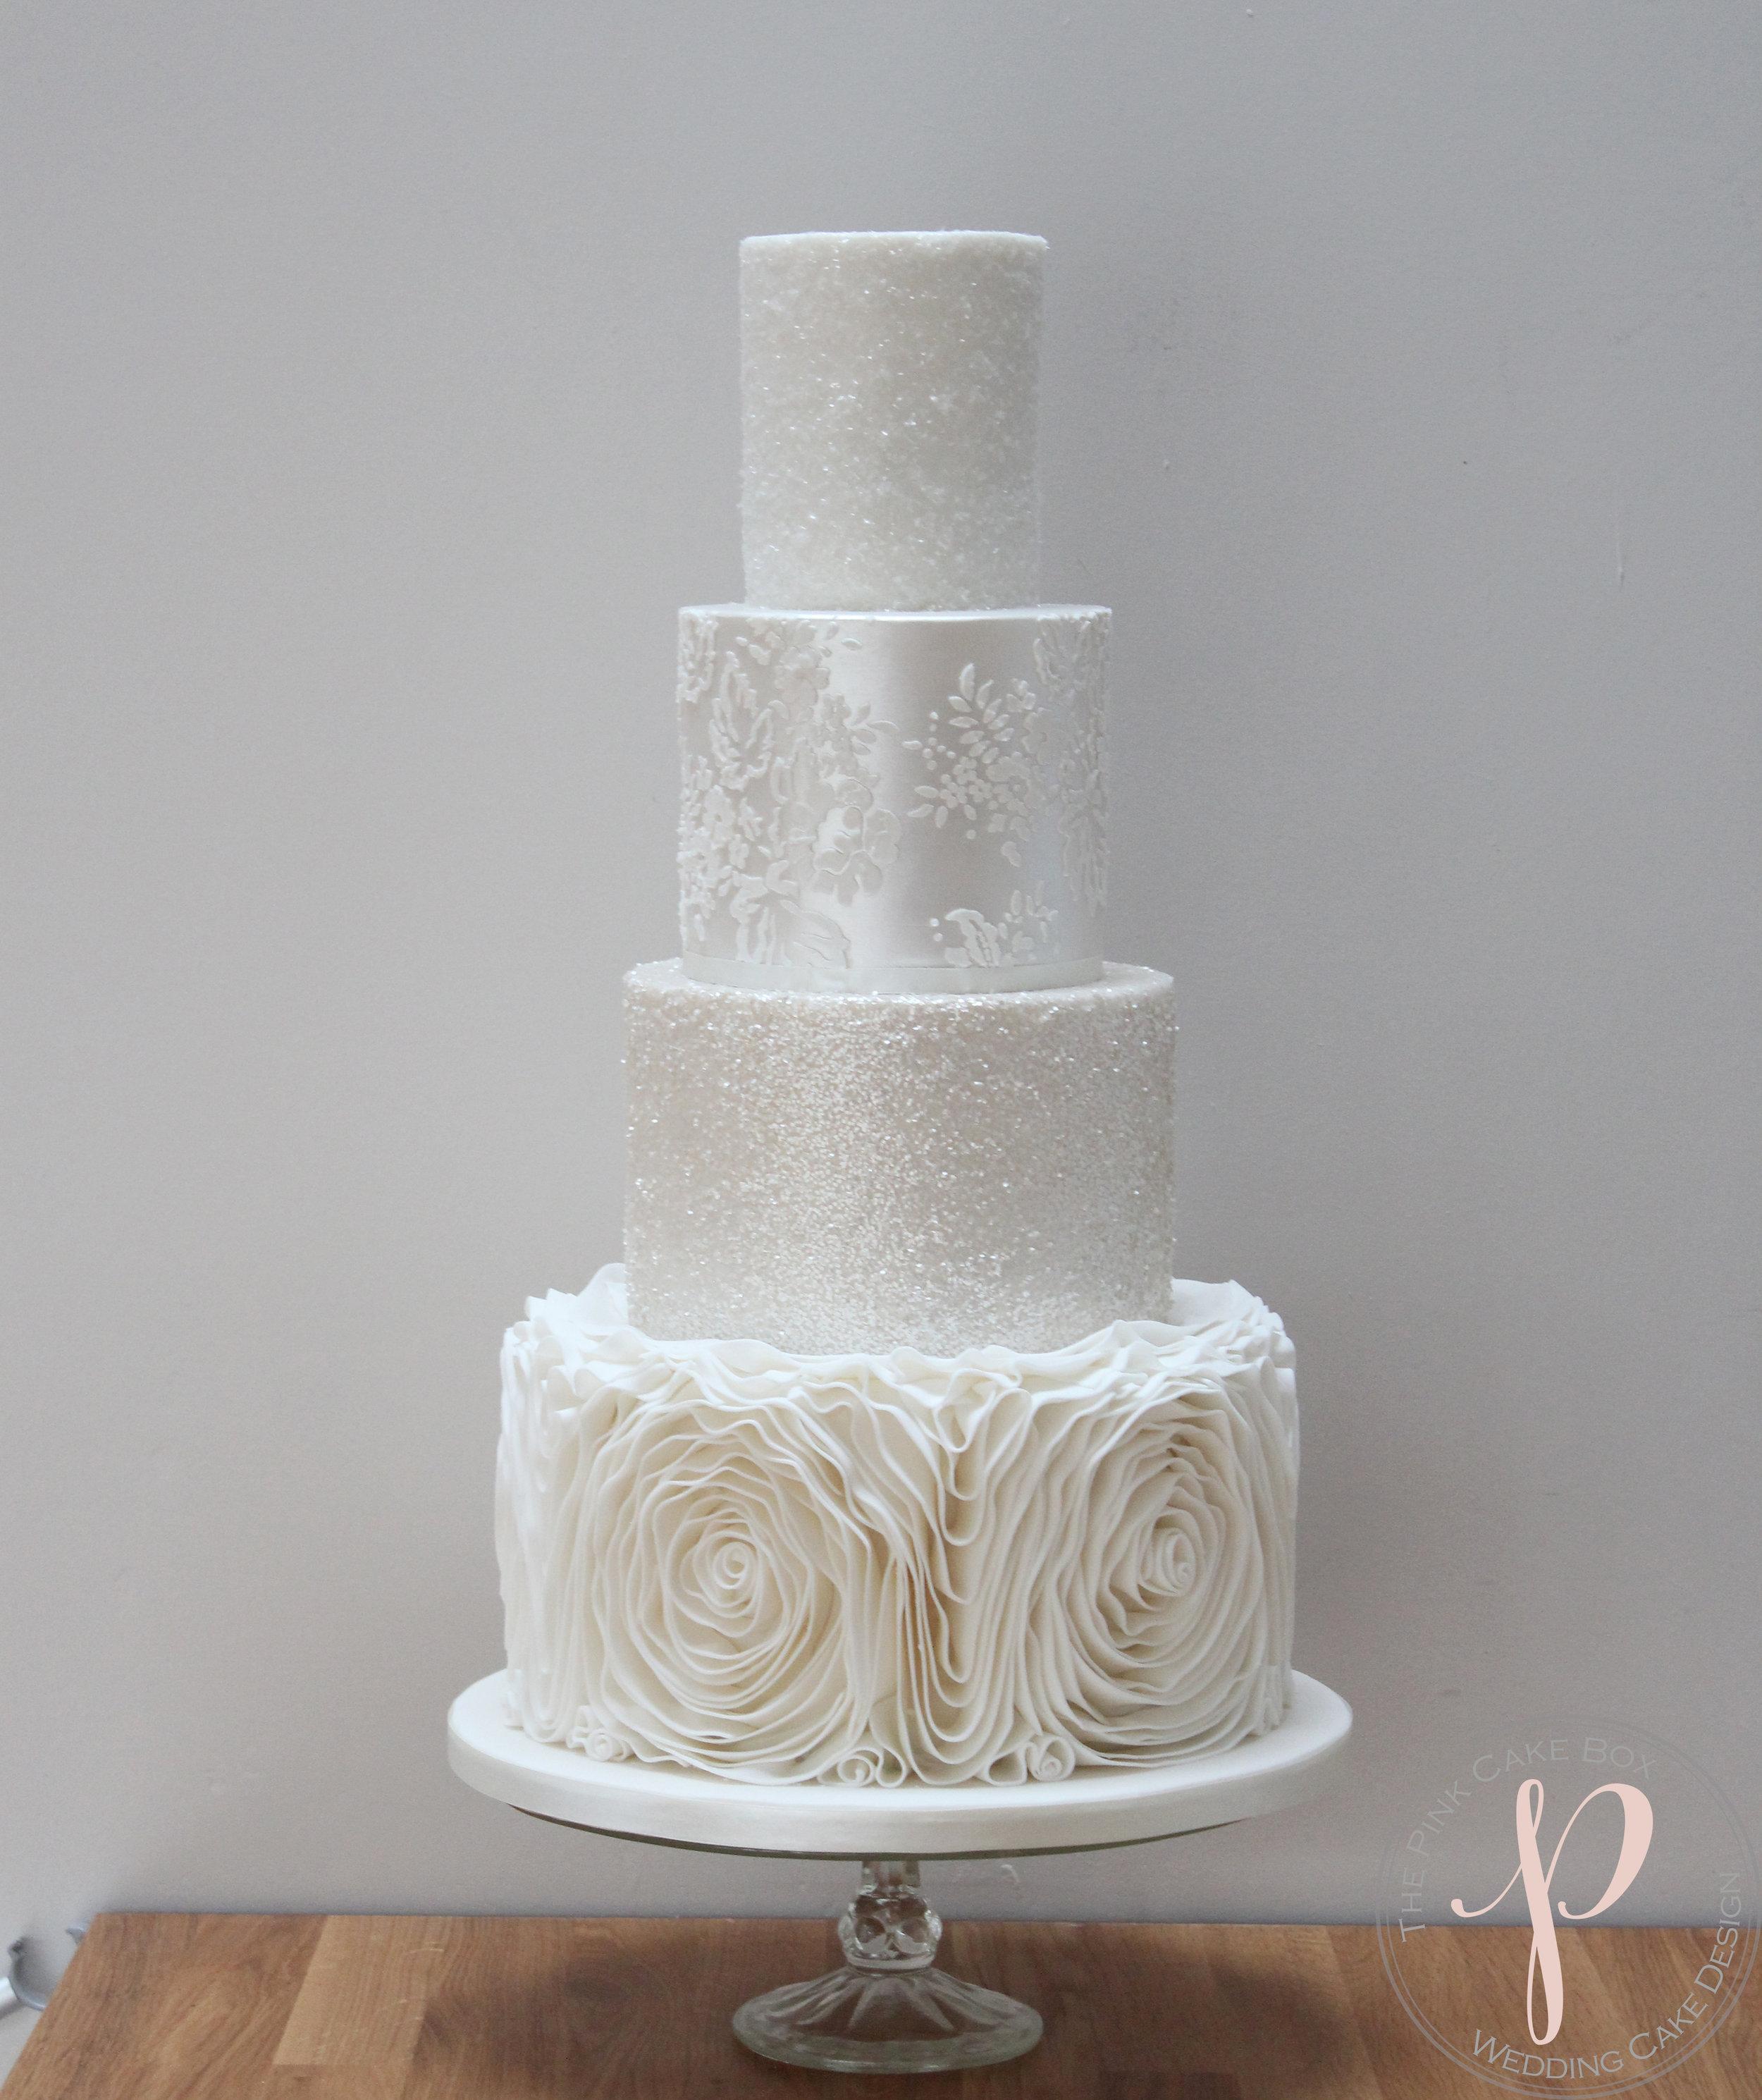 sparkly wedding cake with ruffles.jpg